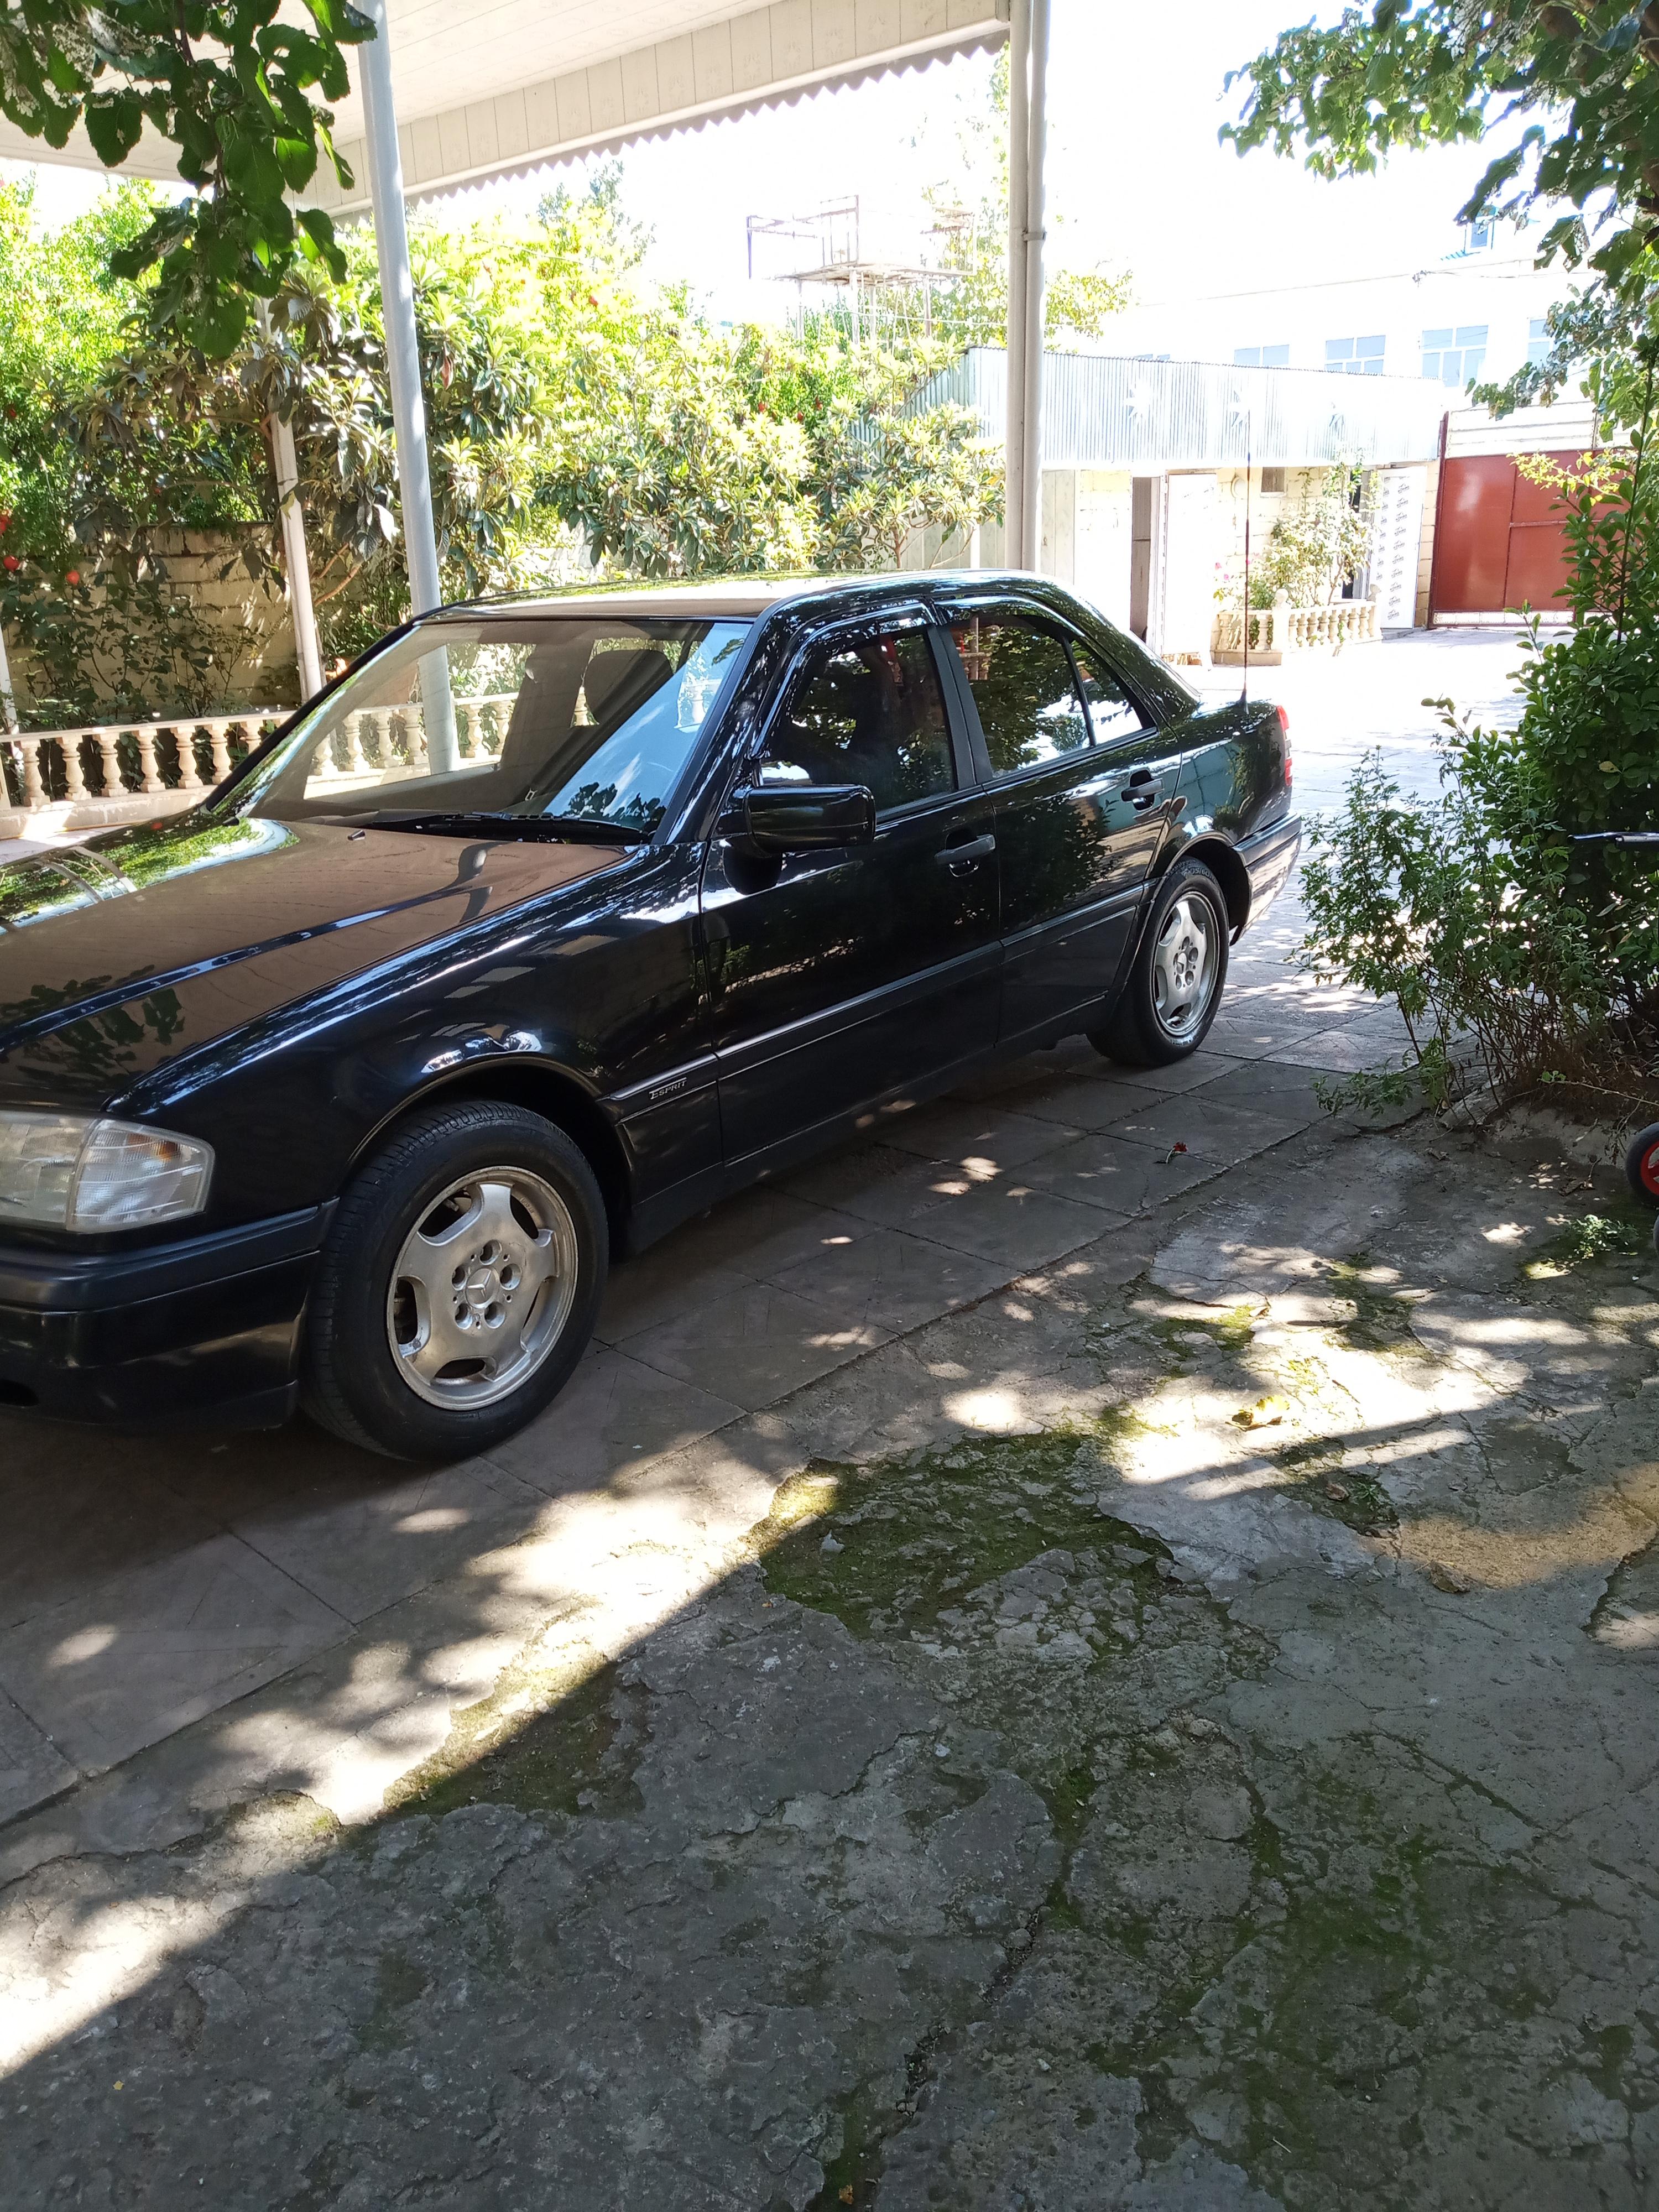 Mercedes-Benz C 180 1.8(lt) 1996 İkinci əl  $6200